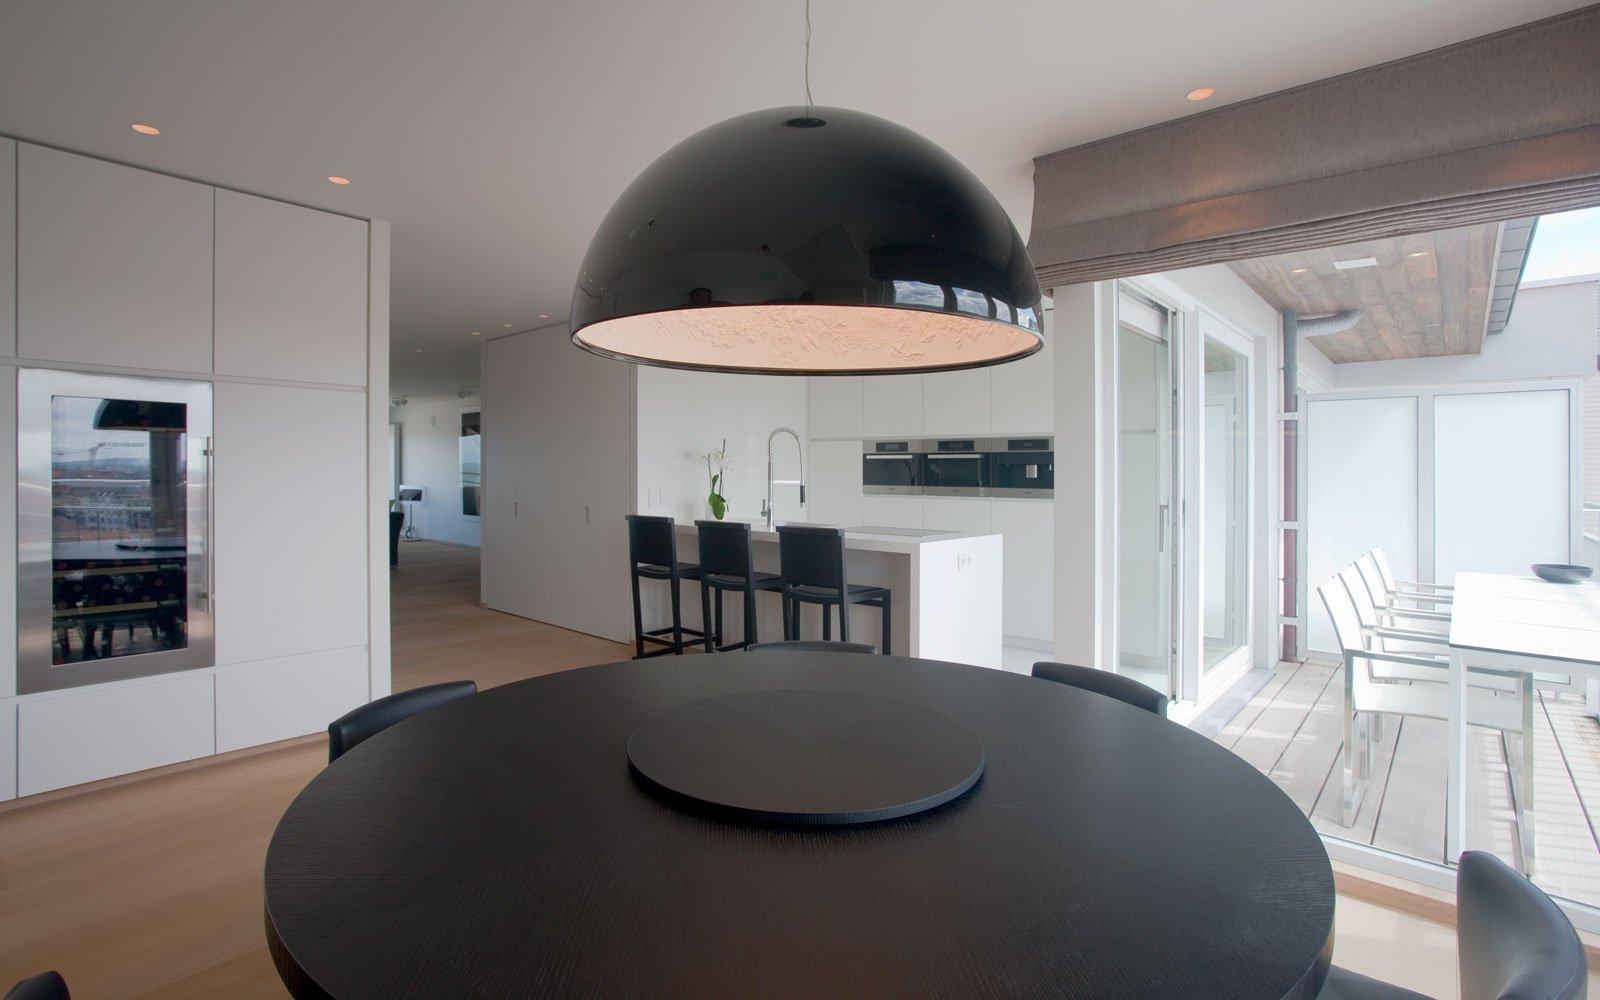 Appartement, woonkamer, keuken, parketvloer, De Voogt Parket, droomappartement, Stephan Gunst